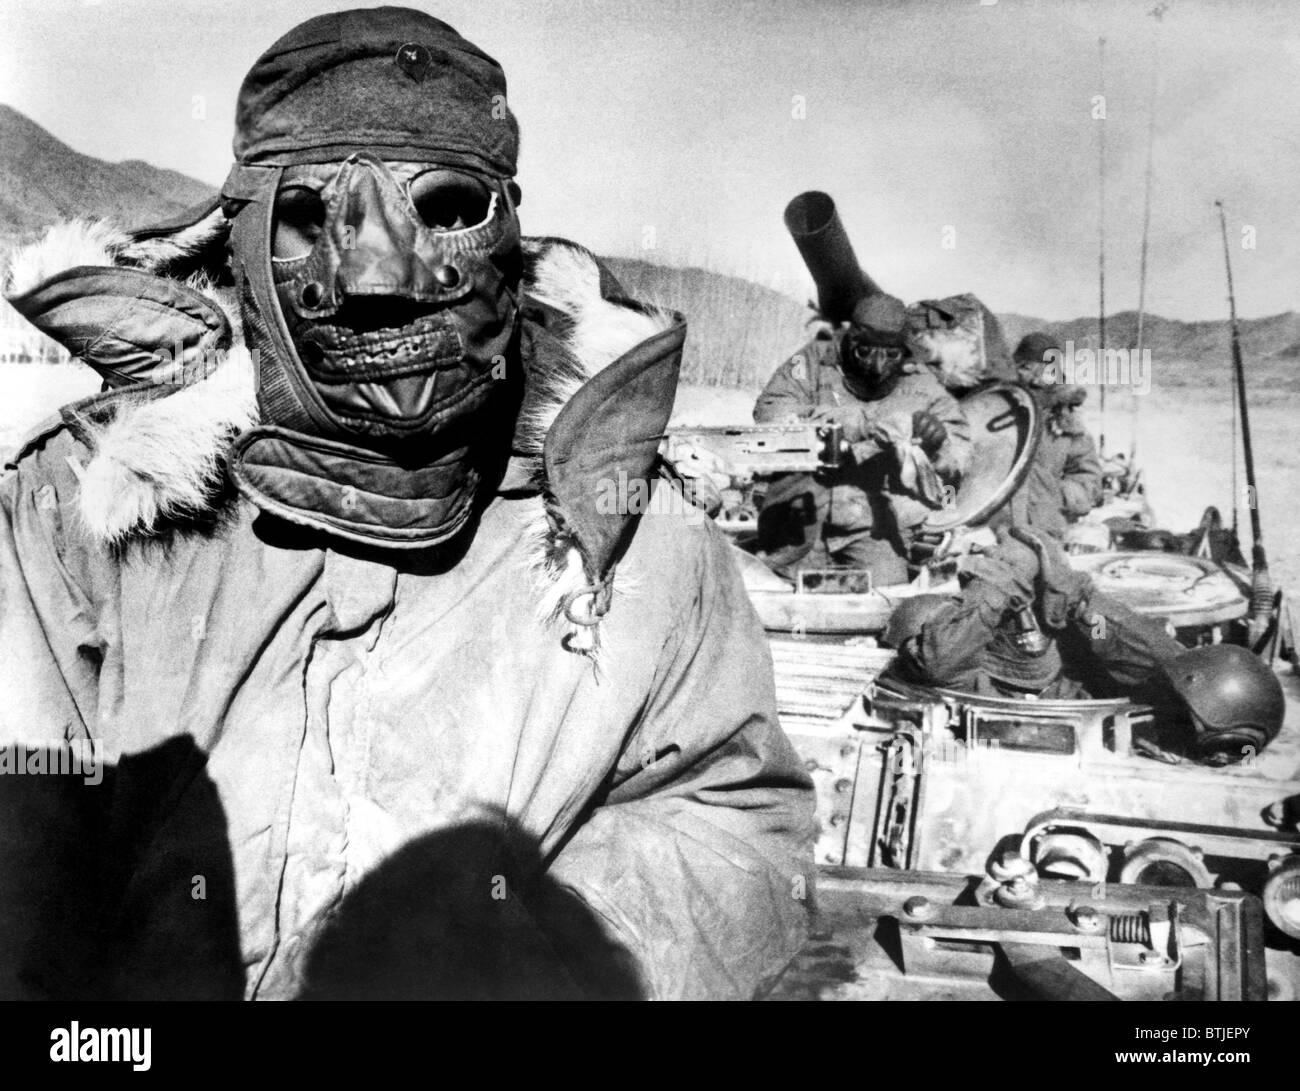 U S Marines In Korea During The Korean War 1951 Stock